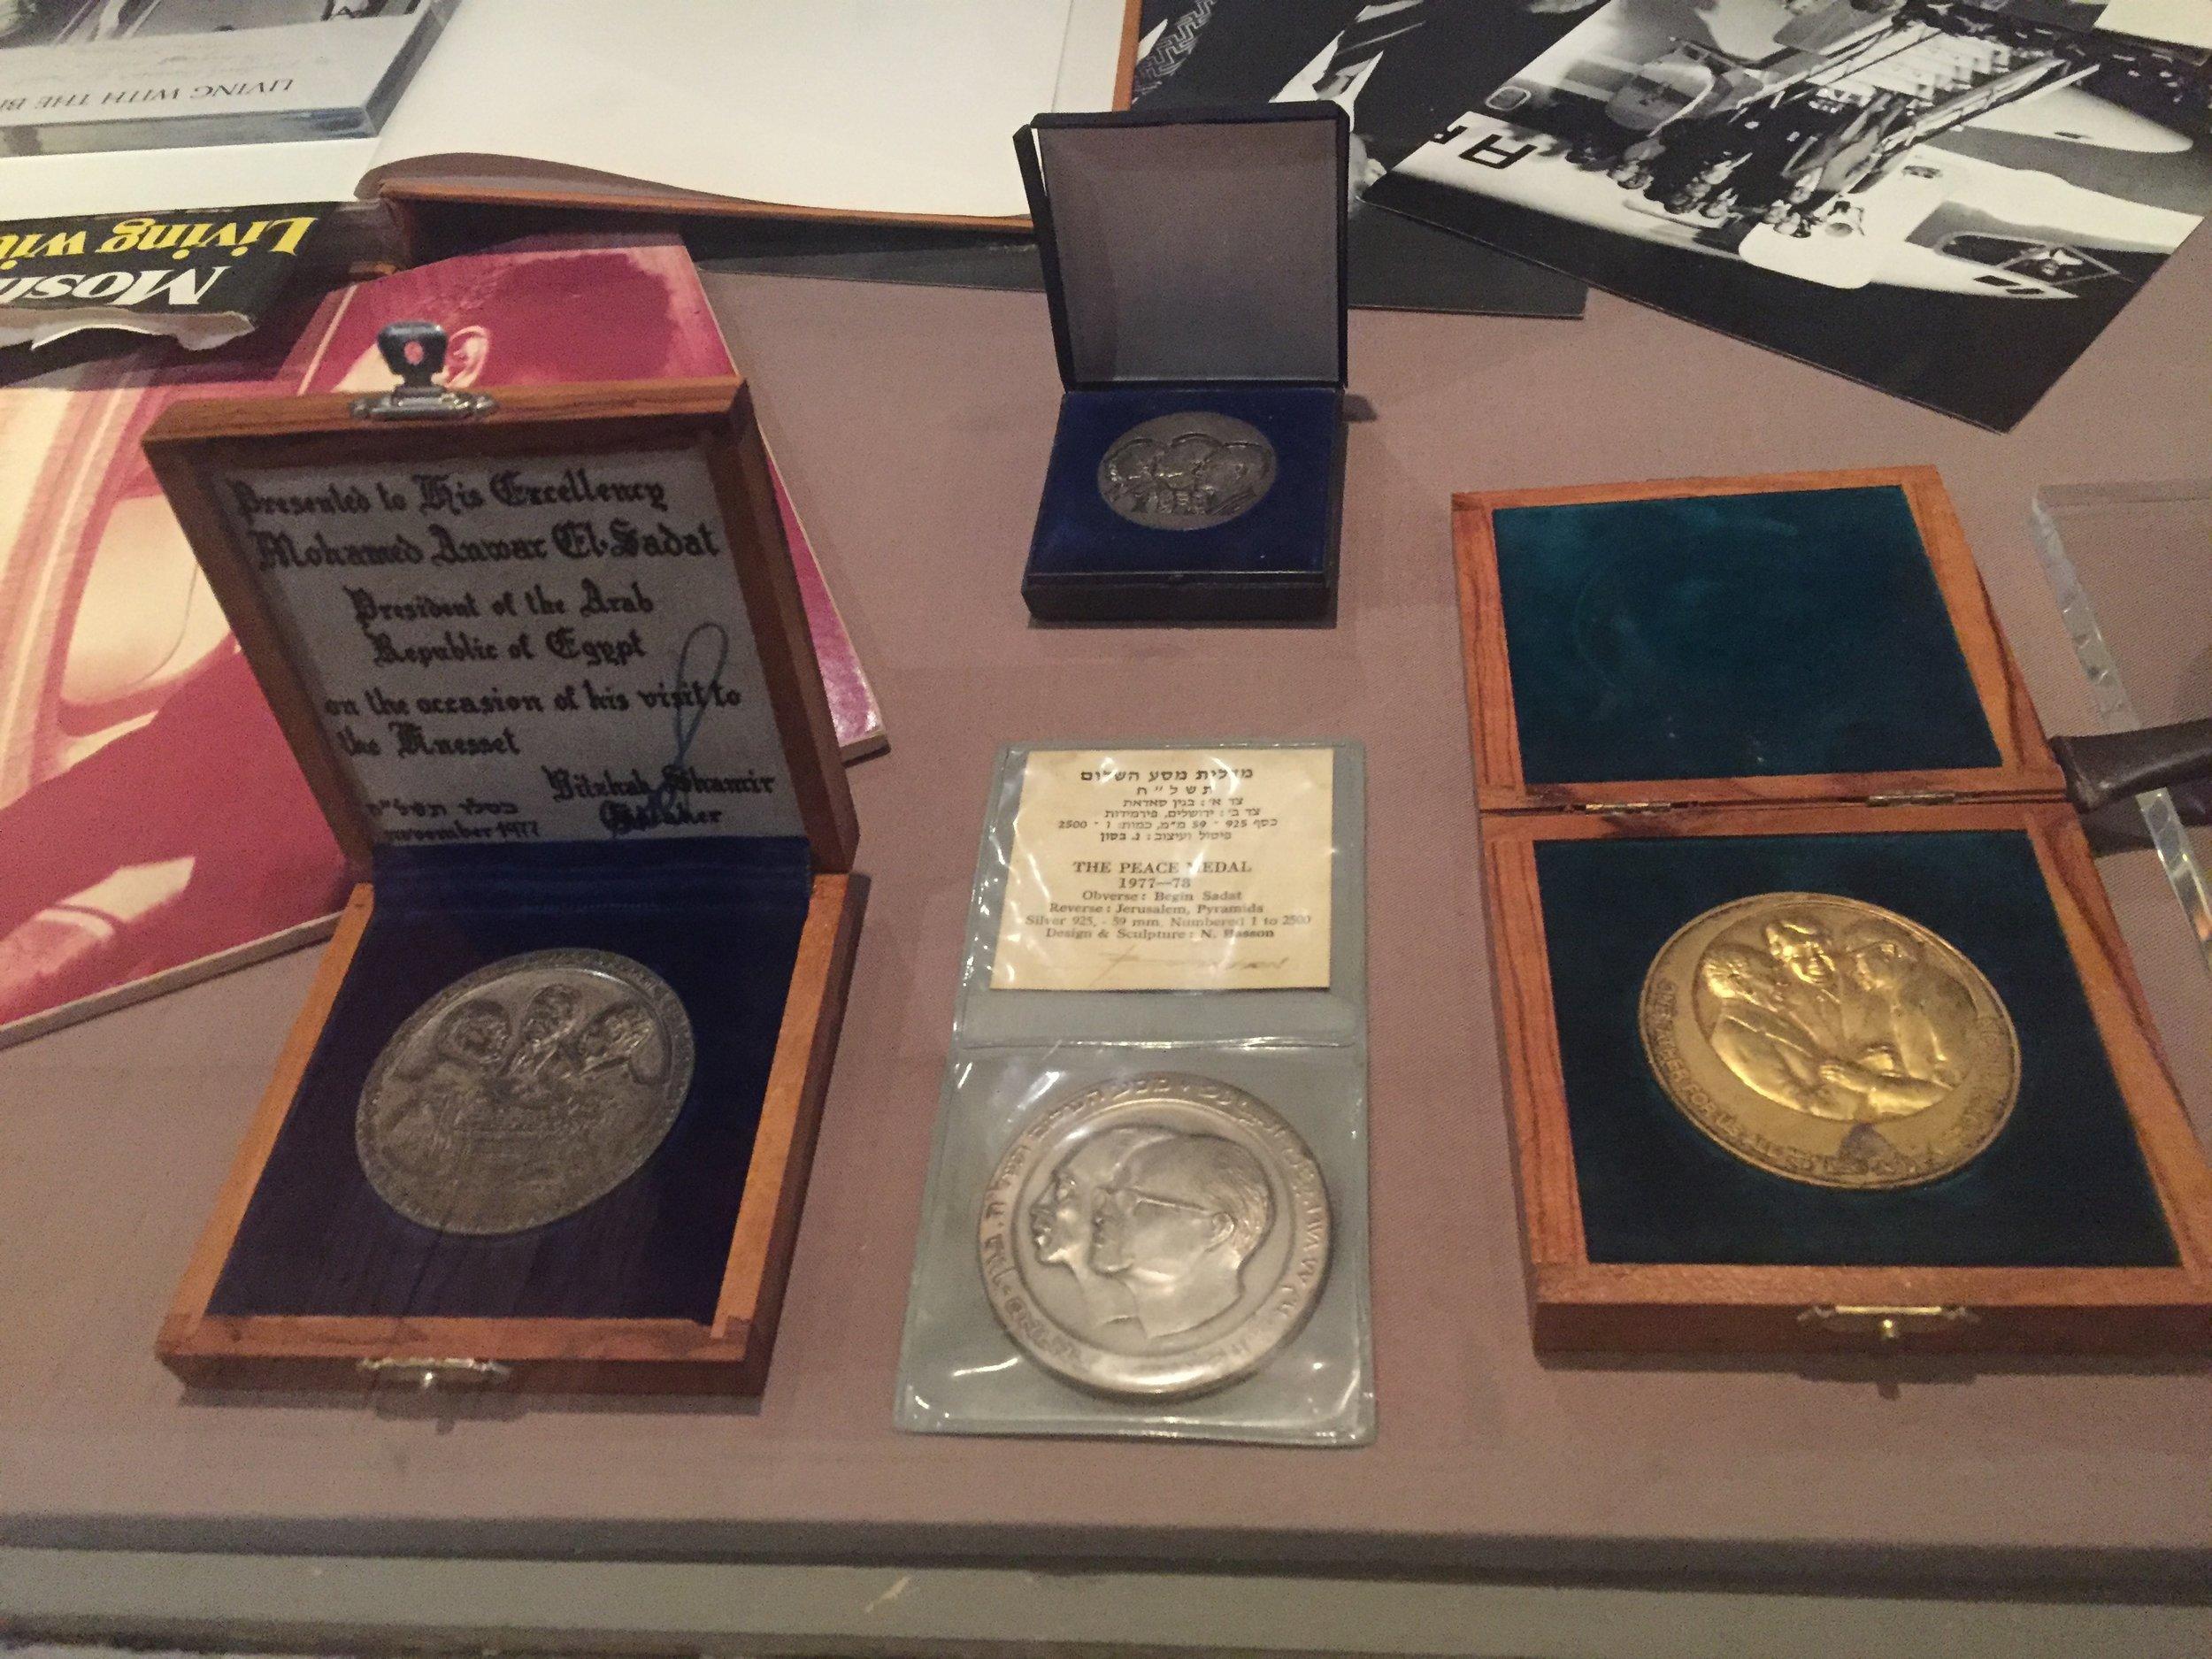 Anwar Sadat's Nobel Prize in the library.